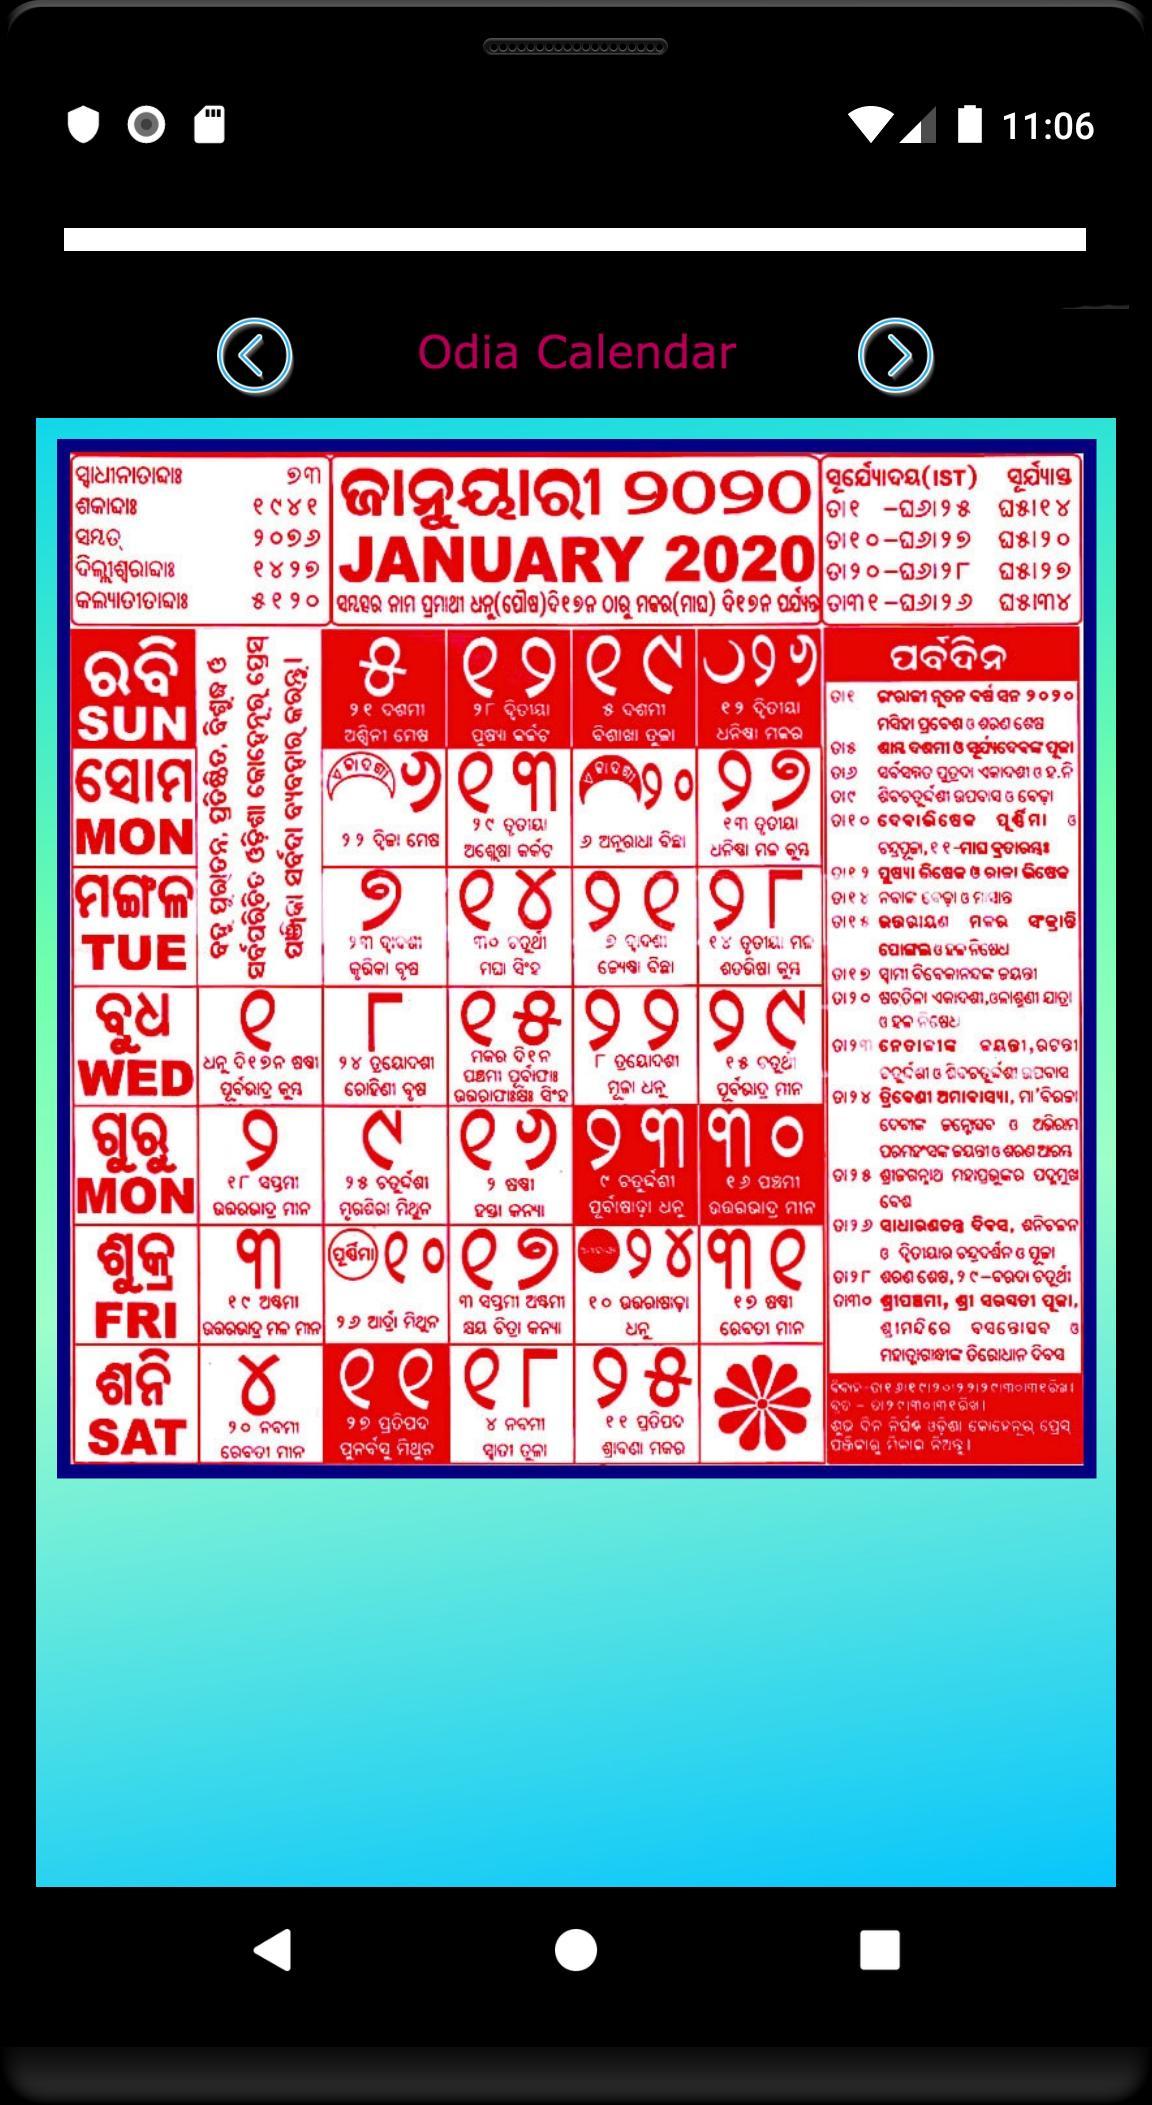 Odia Calendar 2020 Для Андроид  Скачать Apk within Odia Calendar January 2020